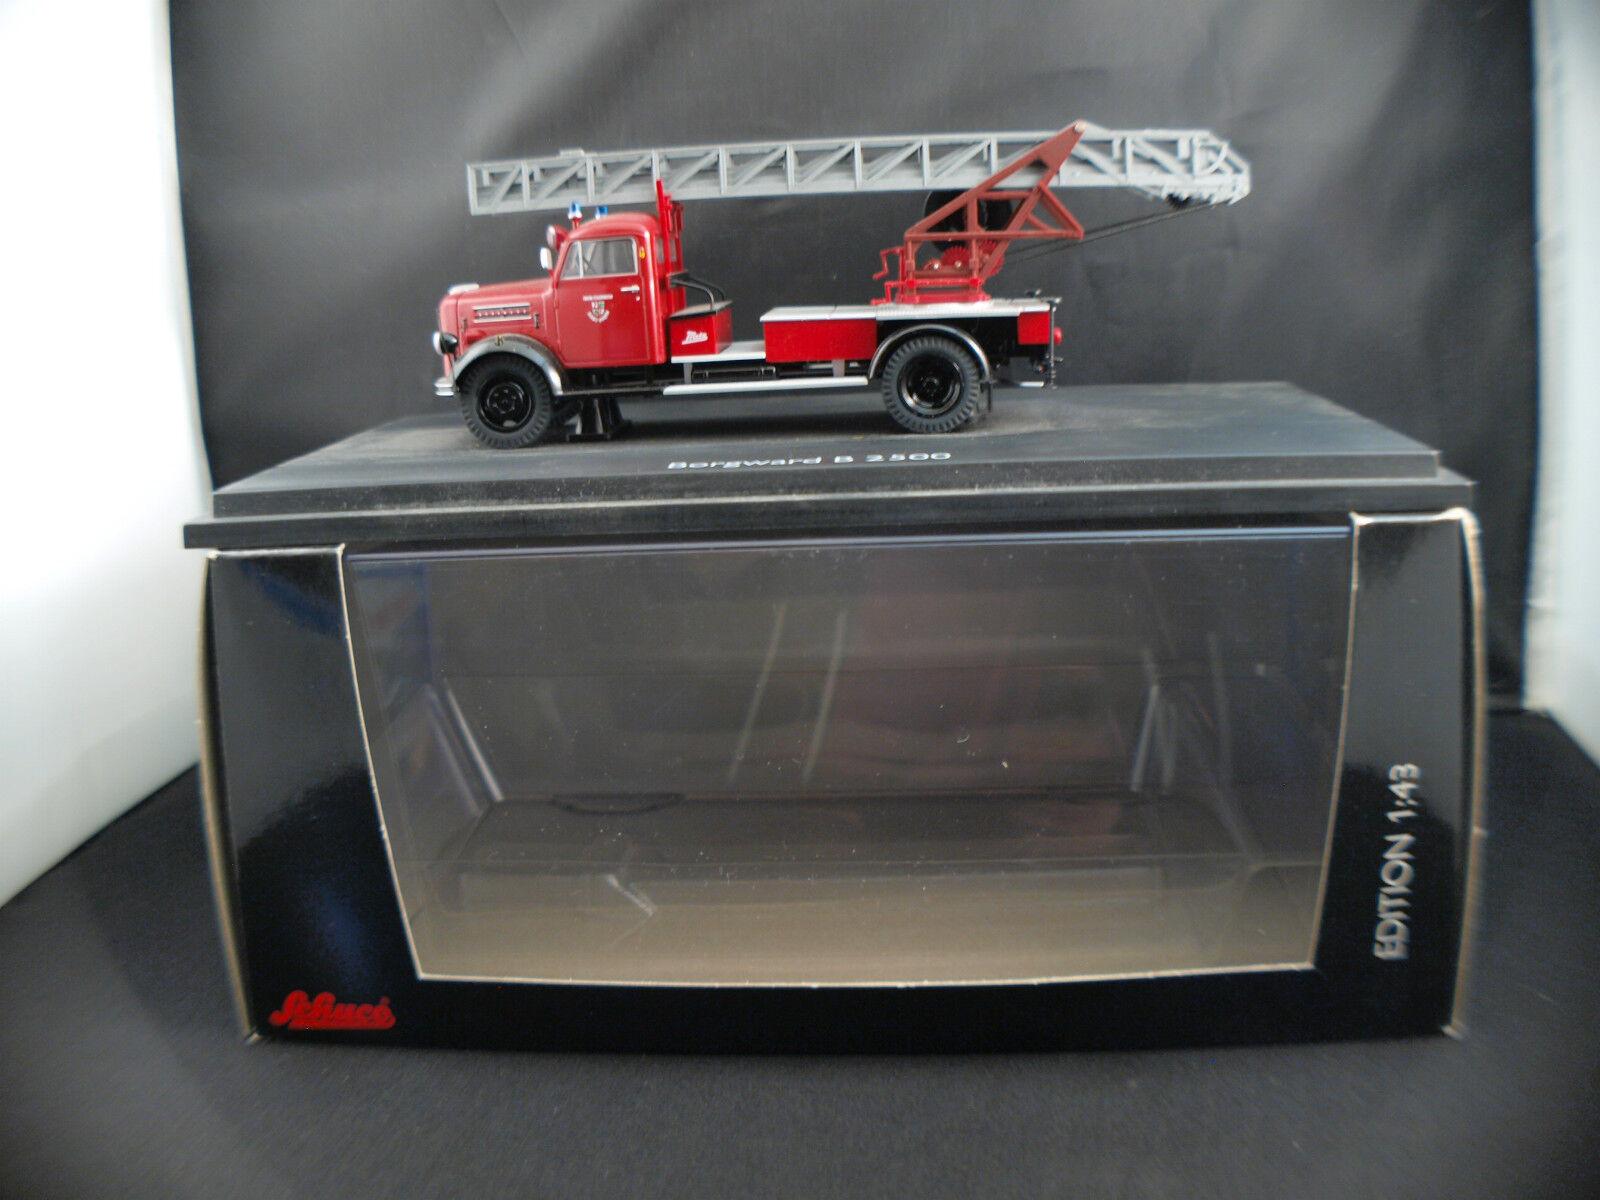 negozio a basso costo Schuco Schuco Schuco 03461 Pompiers Borgward B 2500 Feuerwehr Mayen camion neuf boite 1 43 MIB  vendita con alto sconto